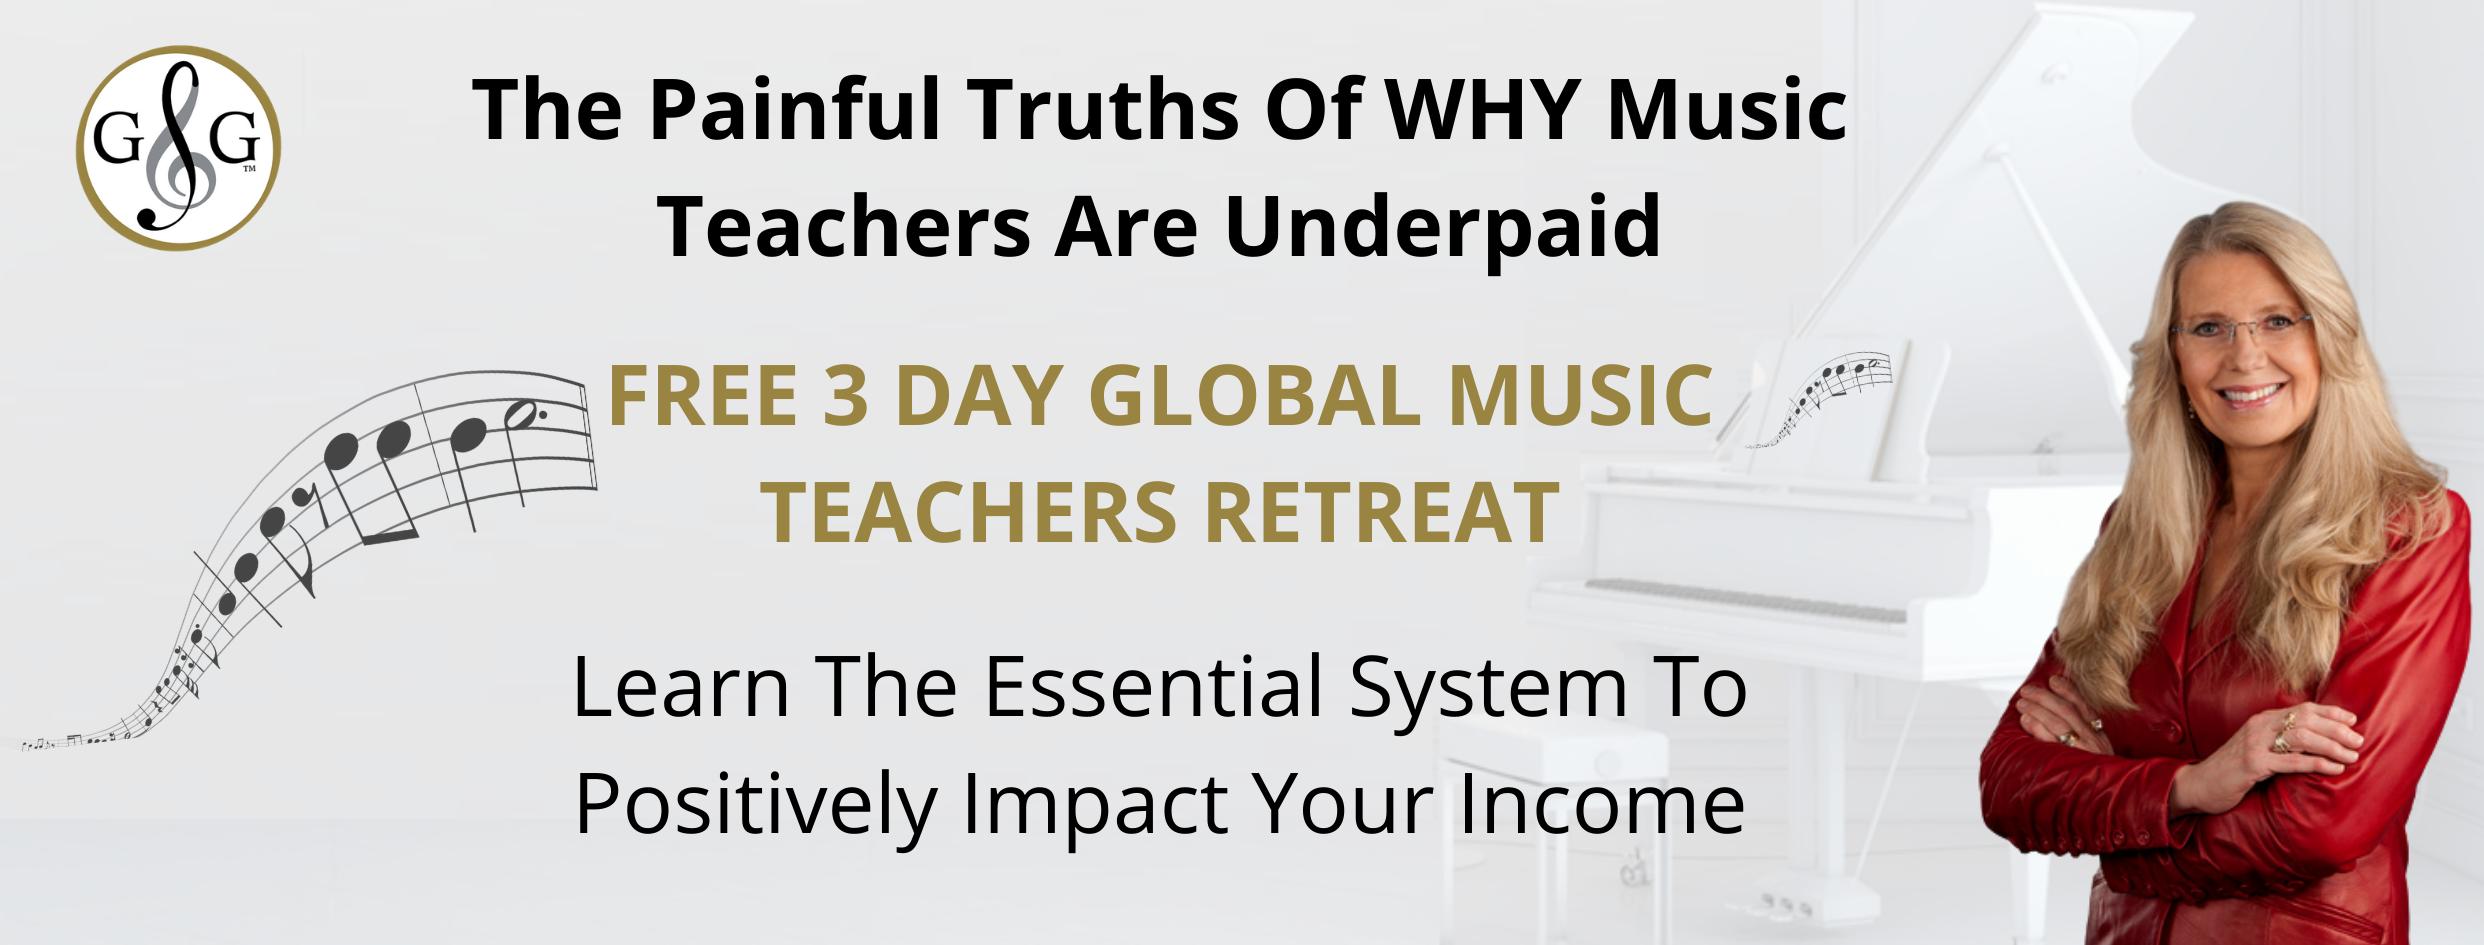 Global Music Teachers Retreat